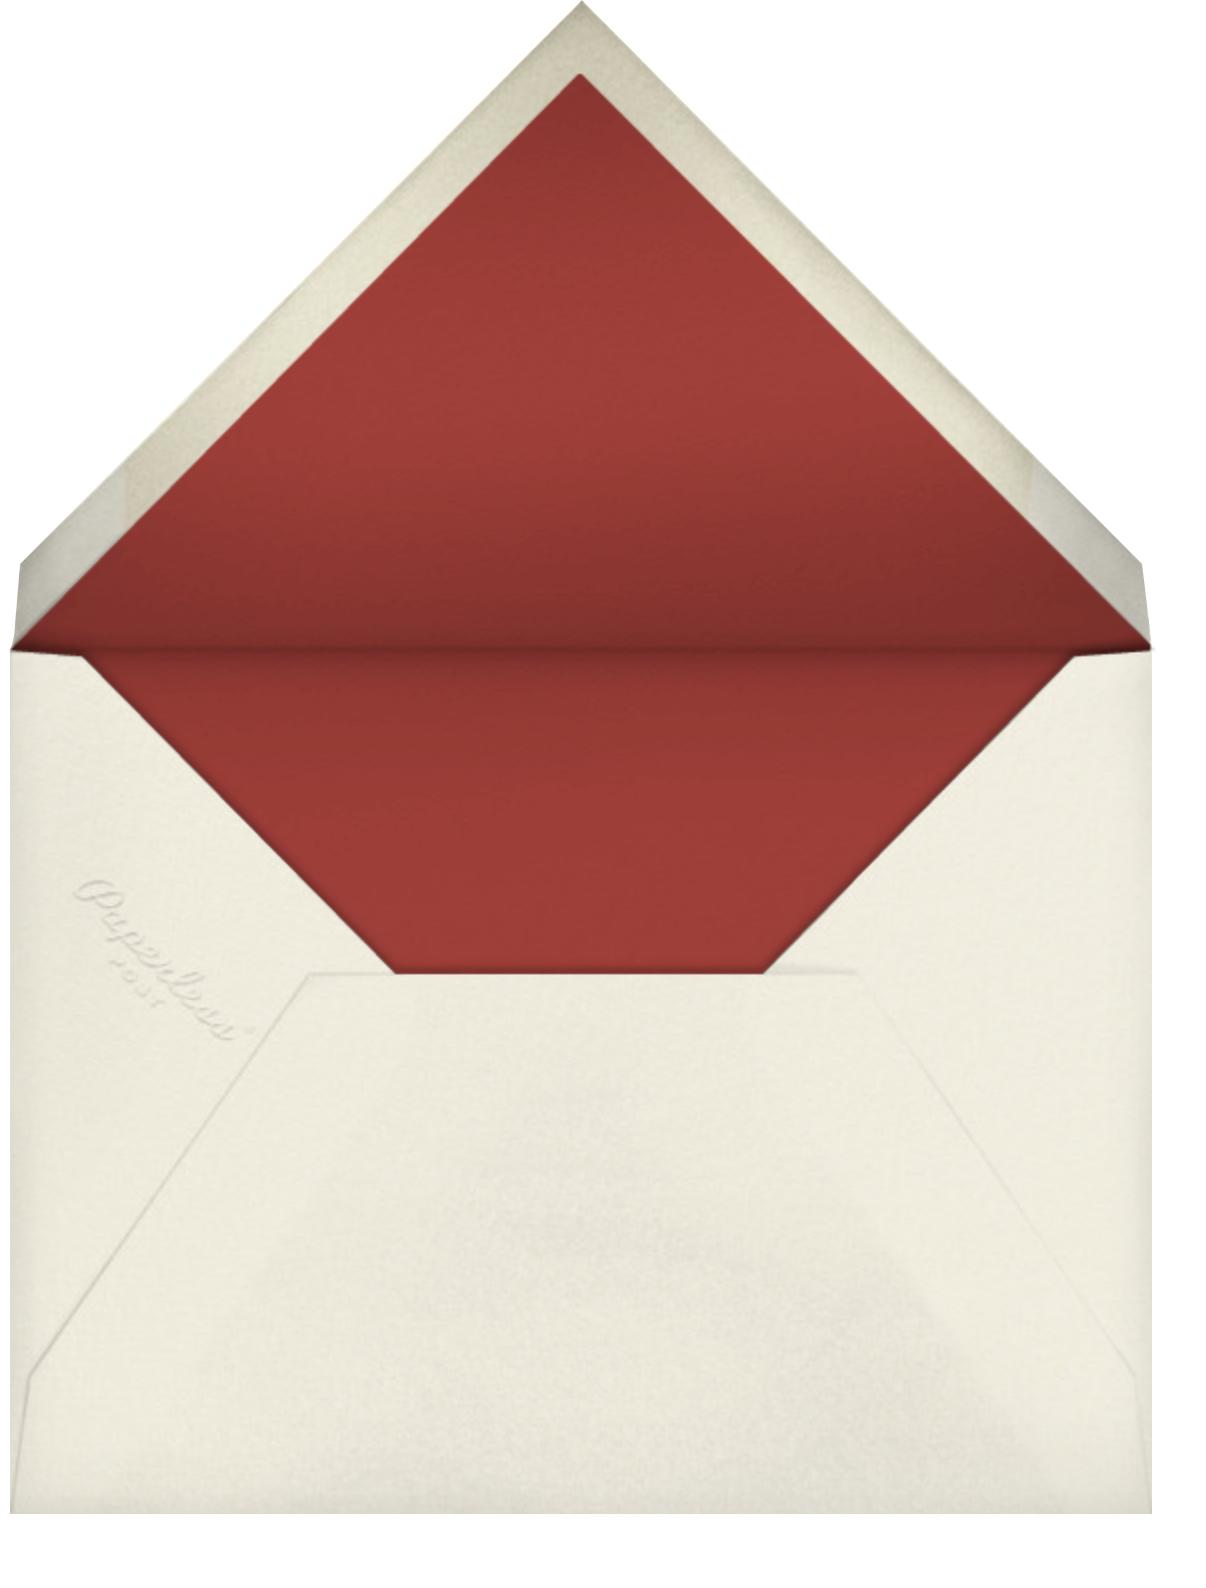 Wild Pansy - Oscar de la Renta - Bridal shower - envelope back